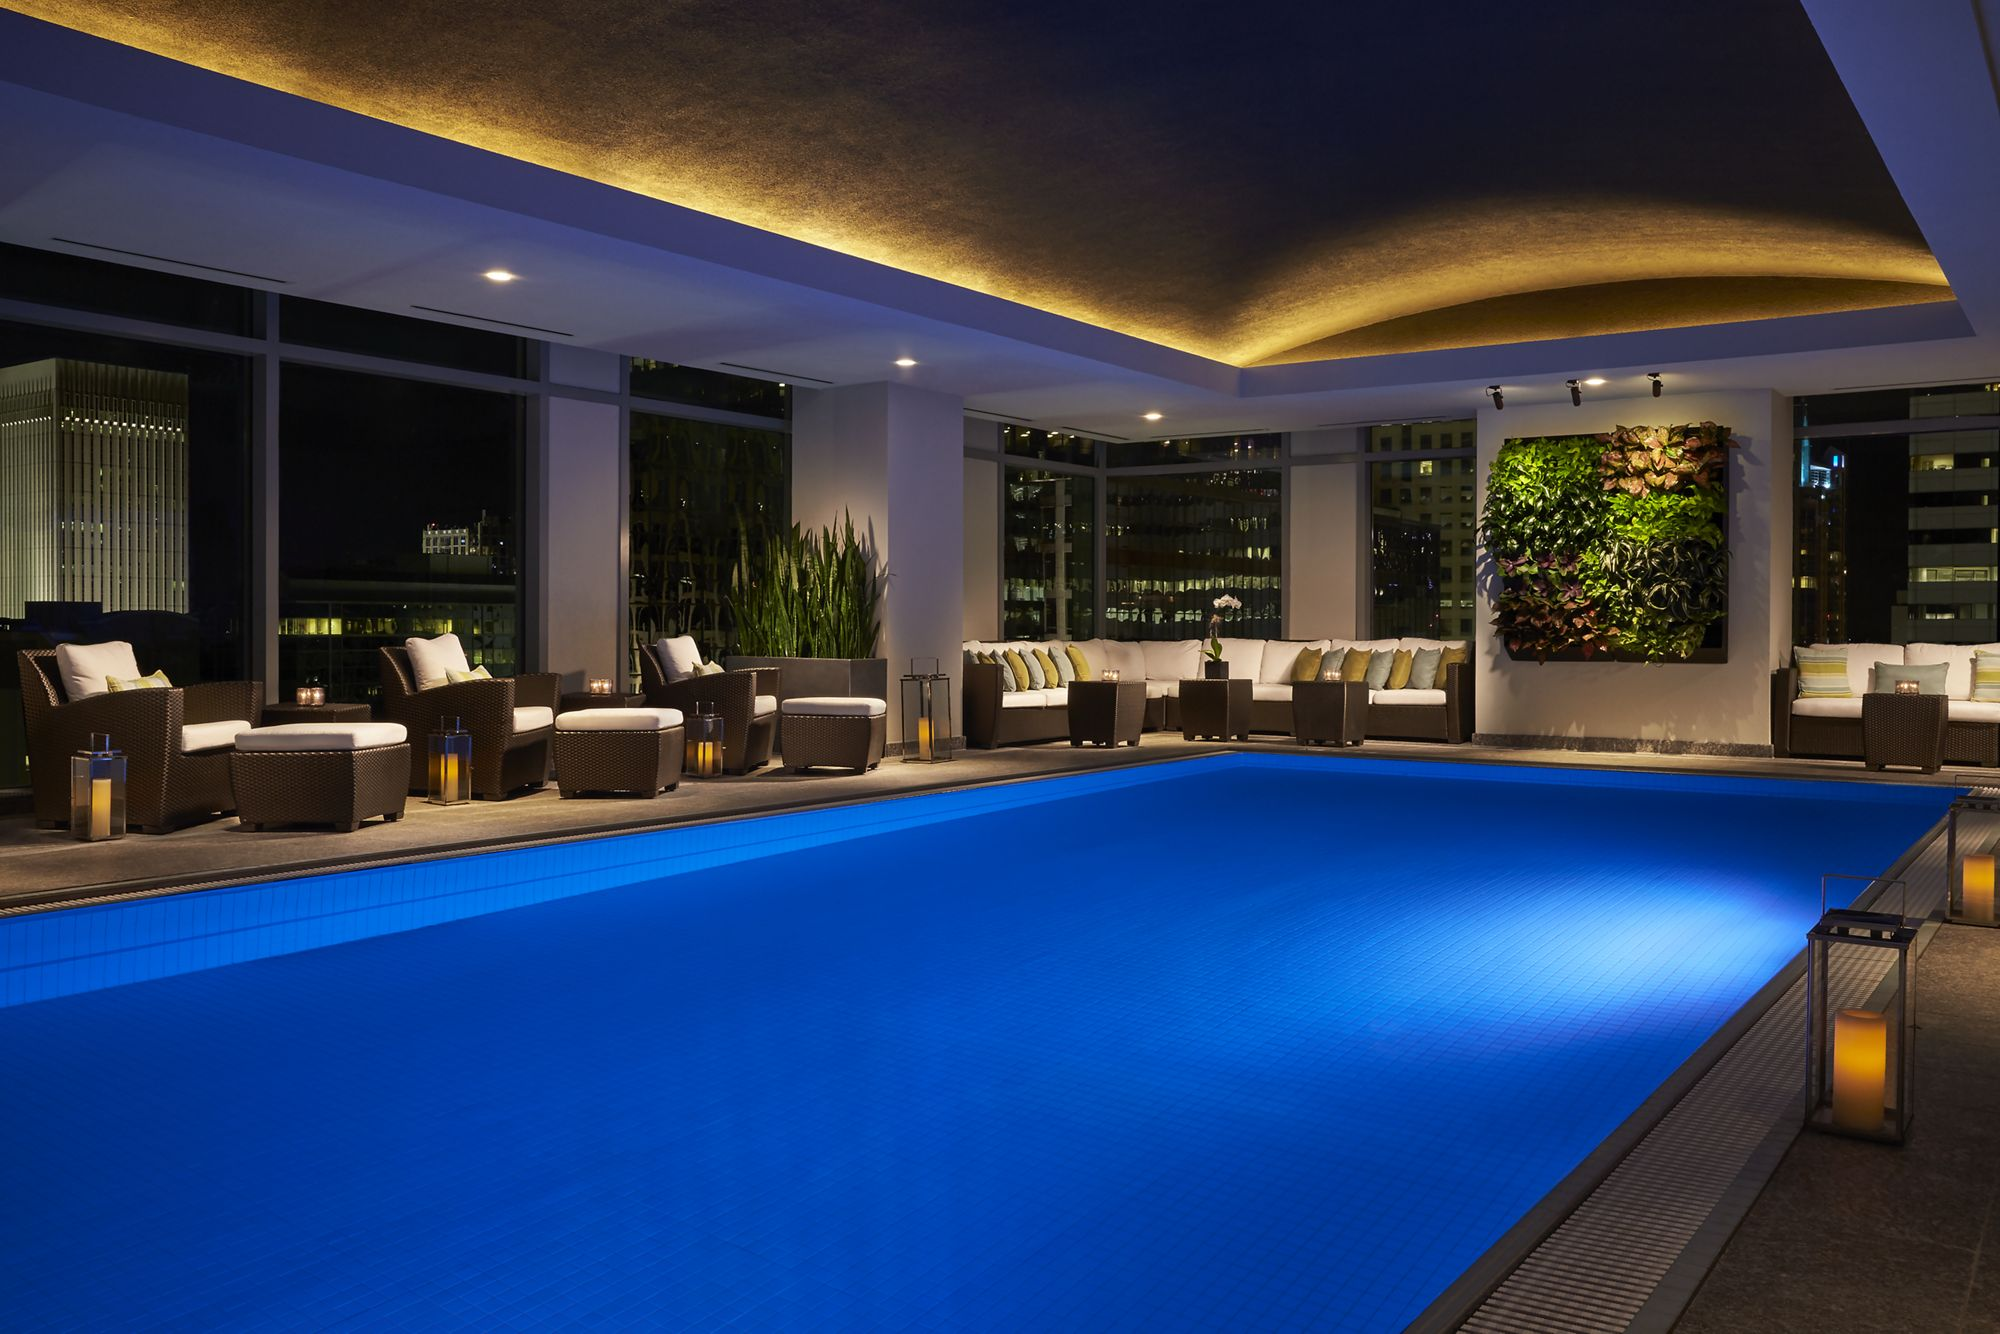 The Ritz-Carlton, Charlotte image 2